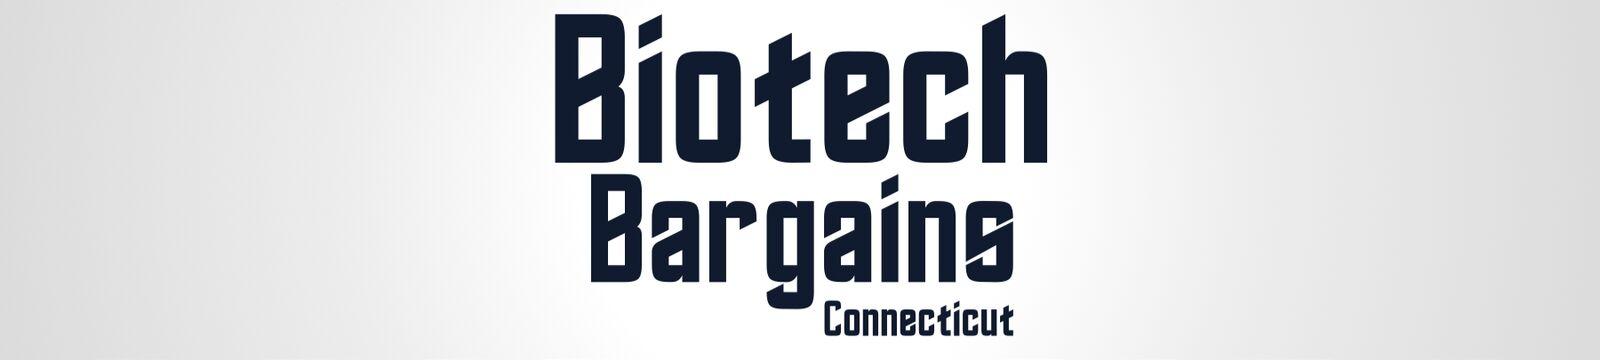 Biotech Bargains